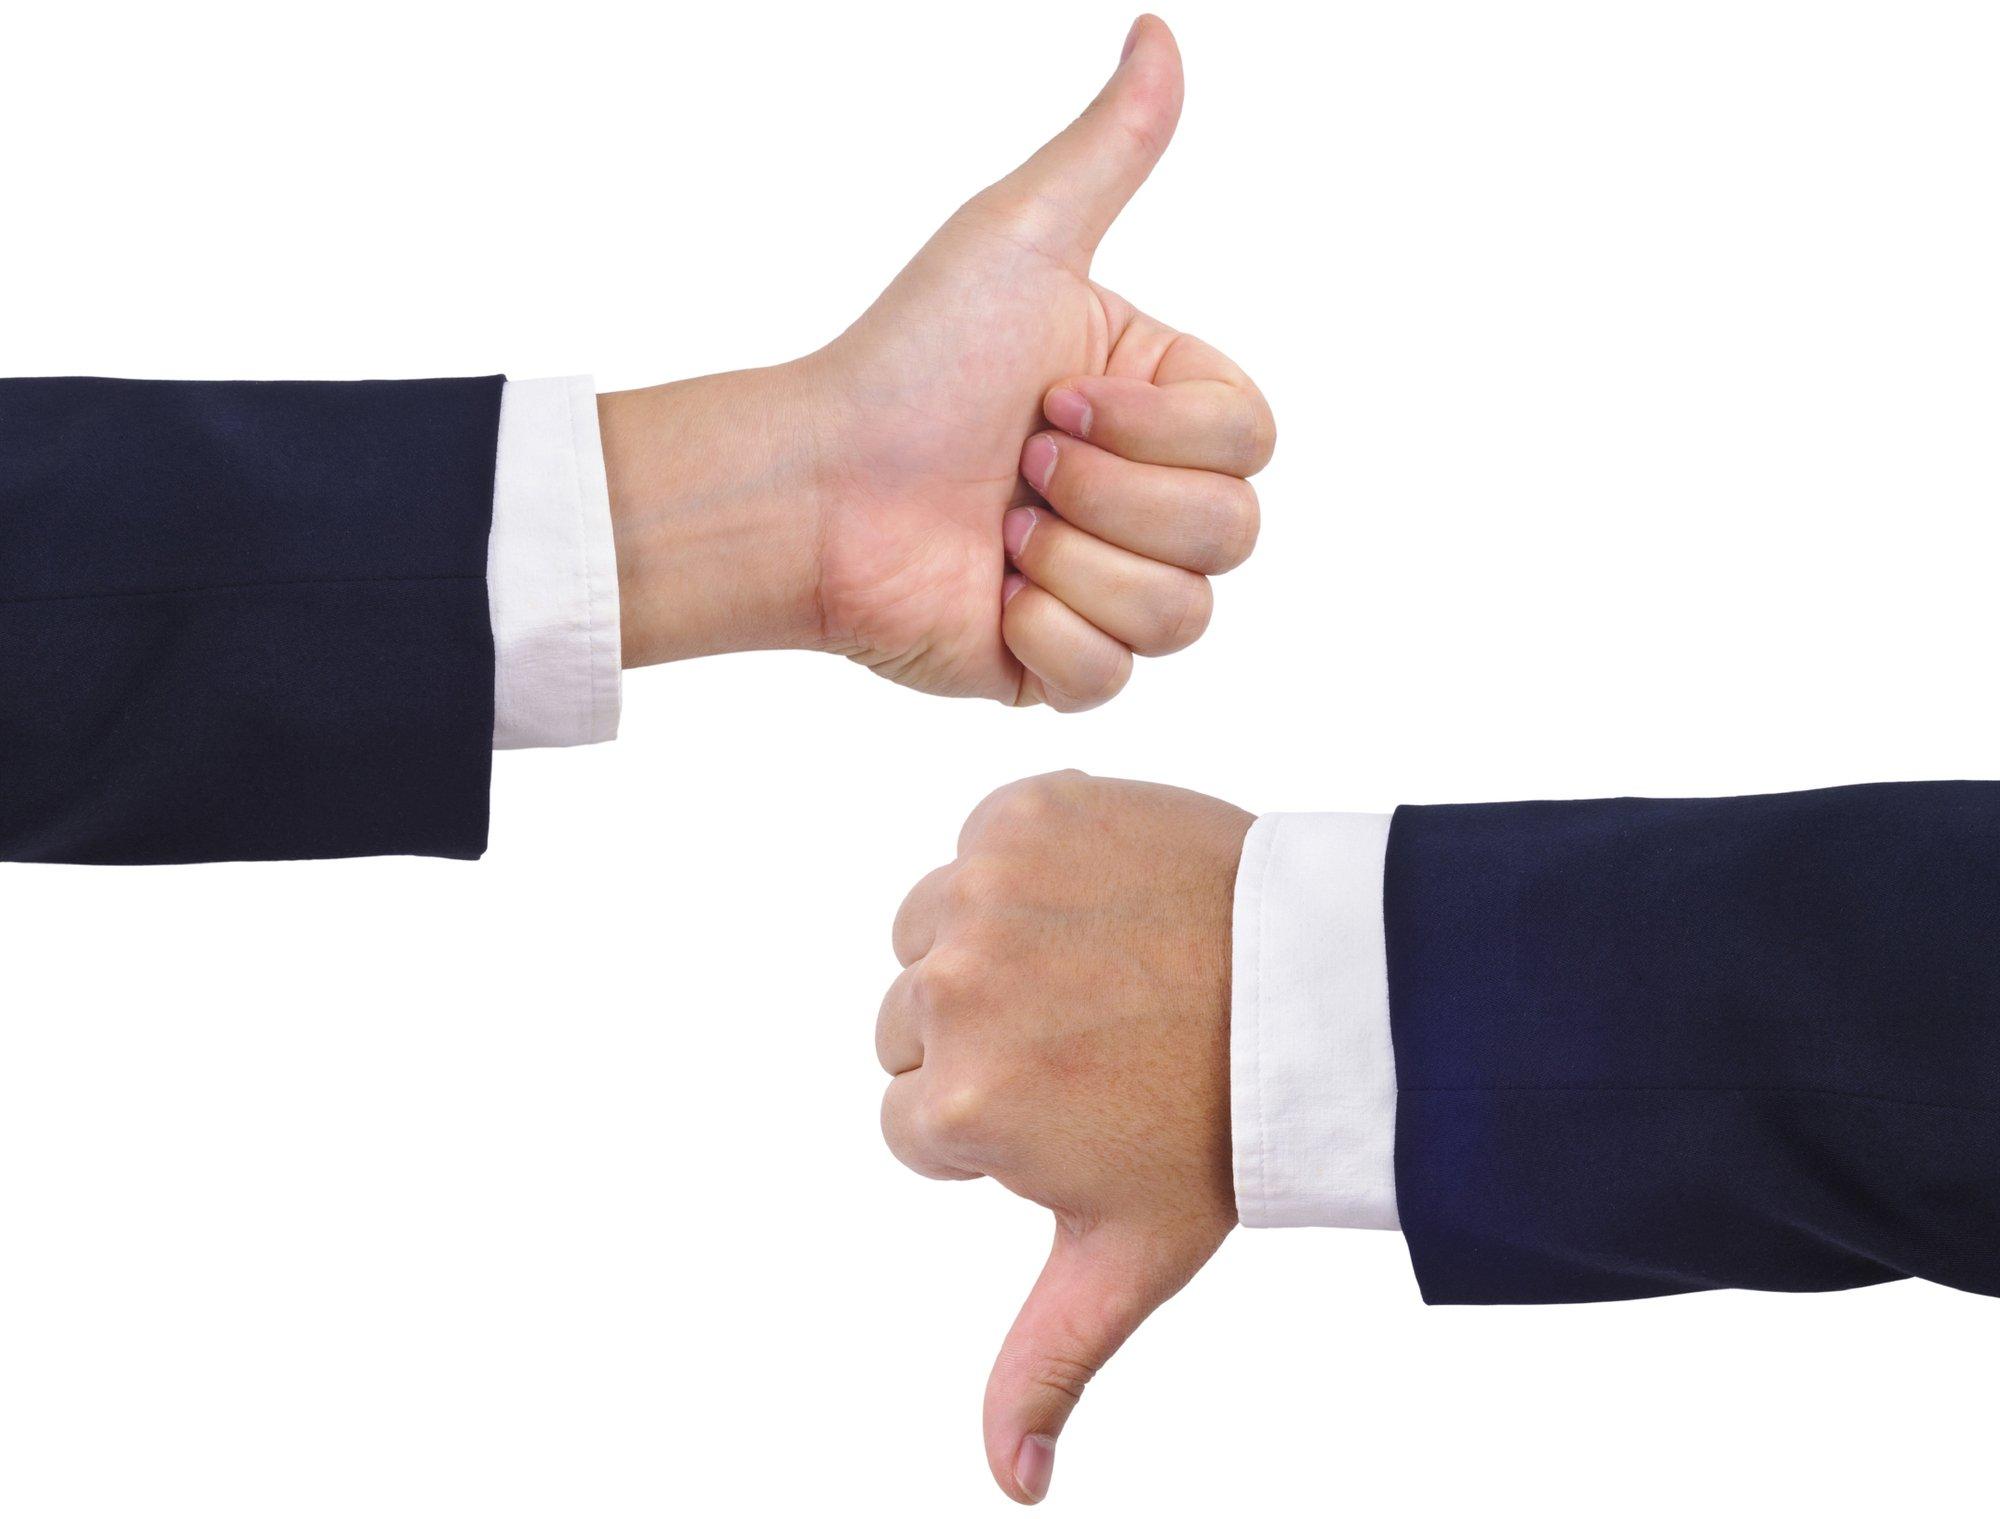 thumbs up thumbs down에 대한 이미지 검색결과